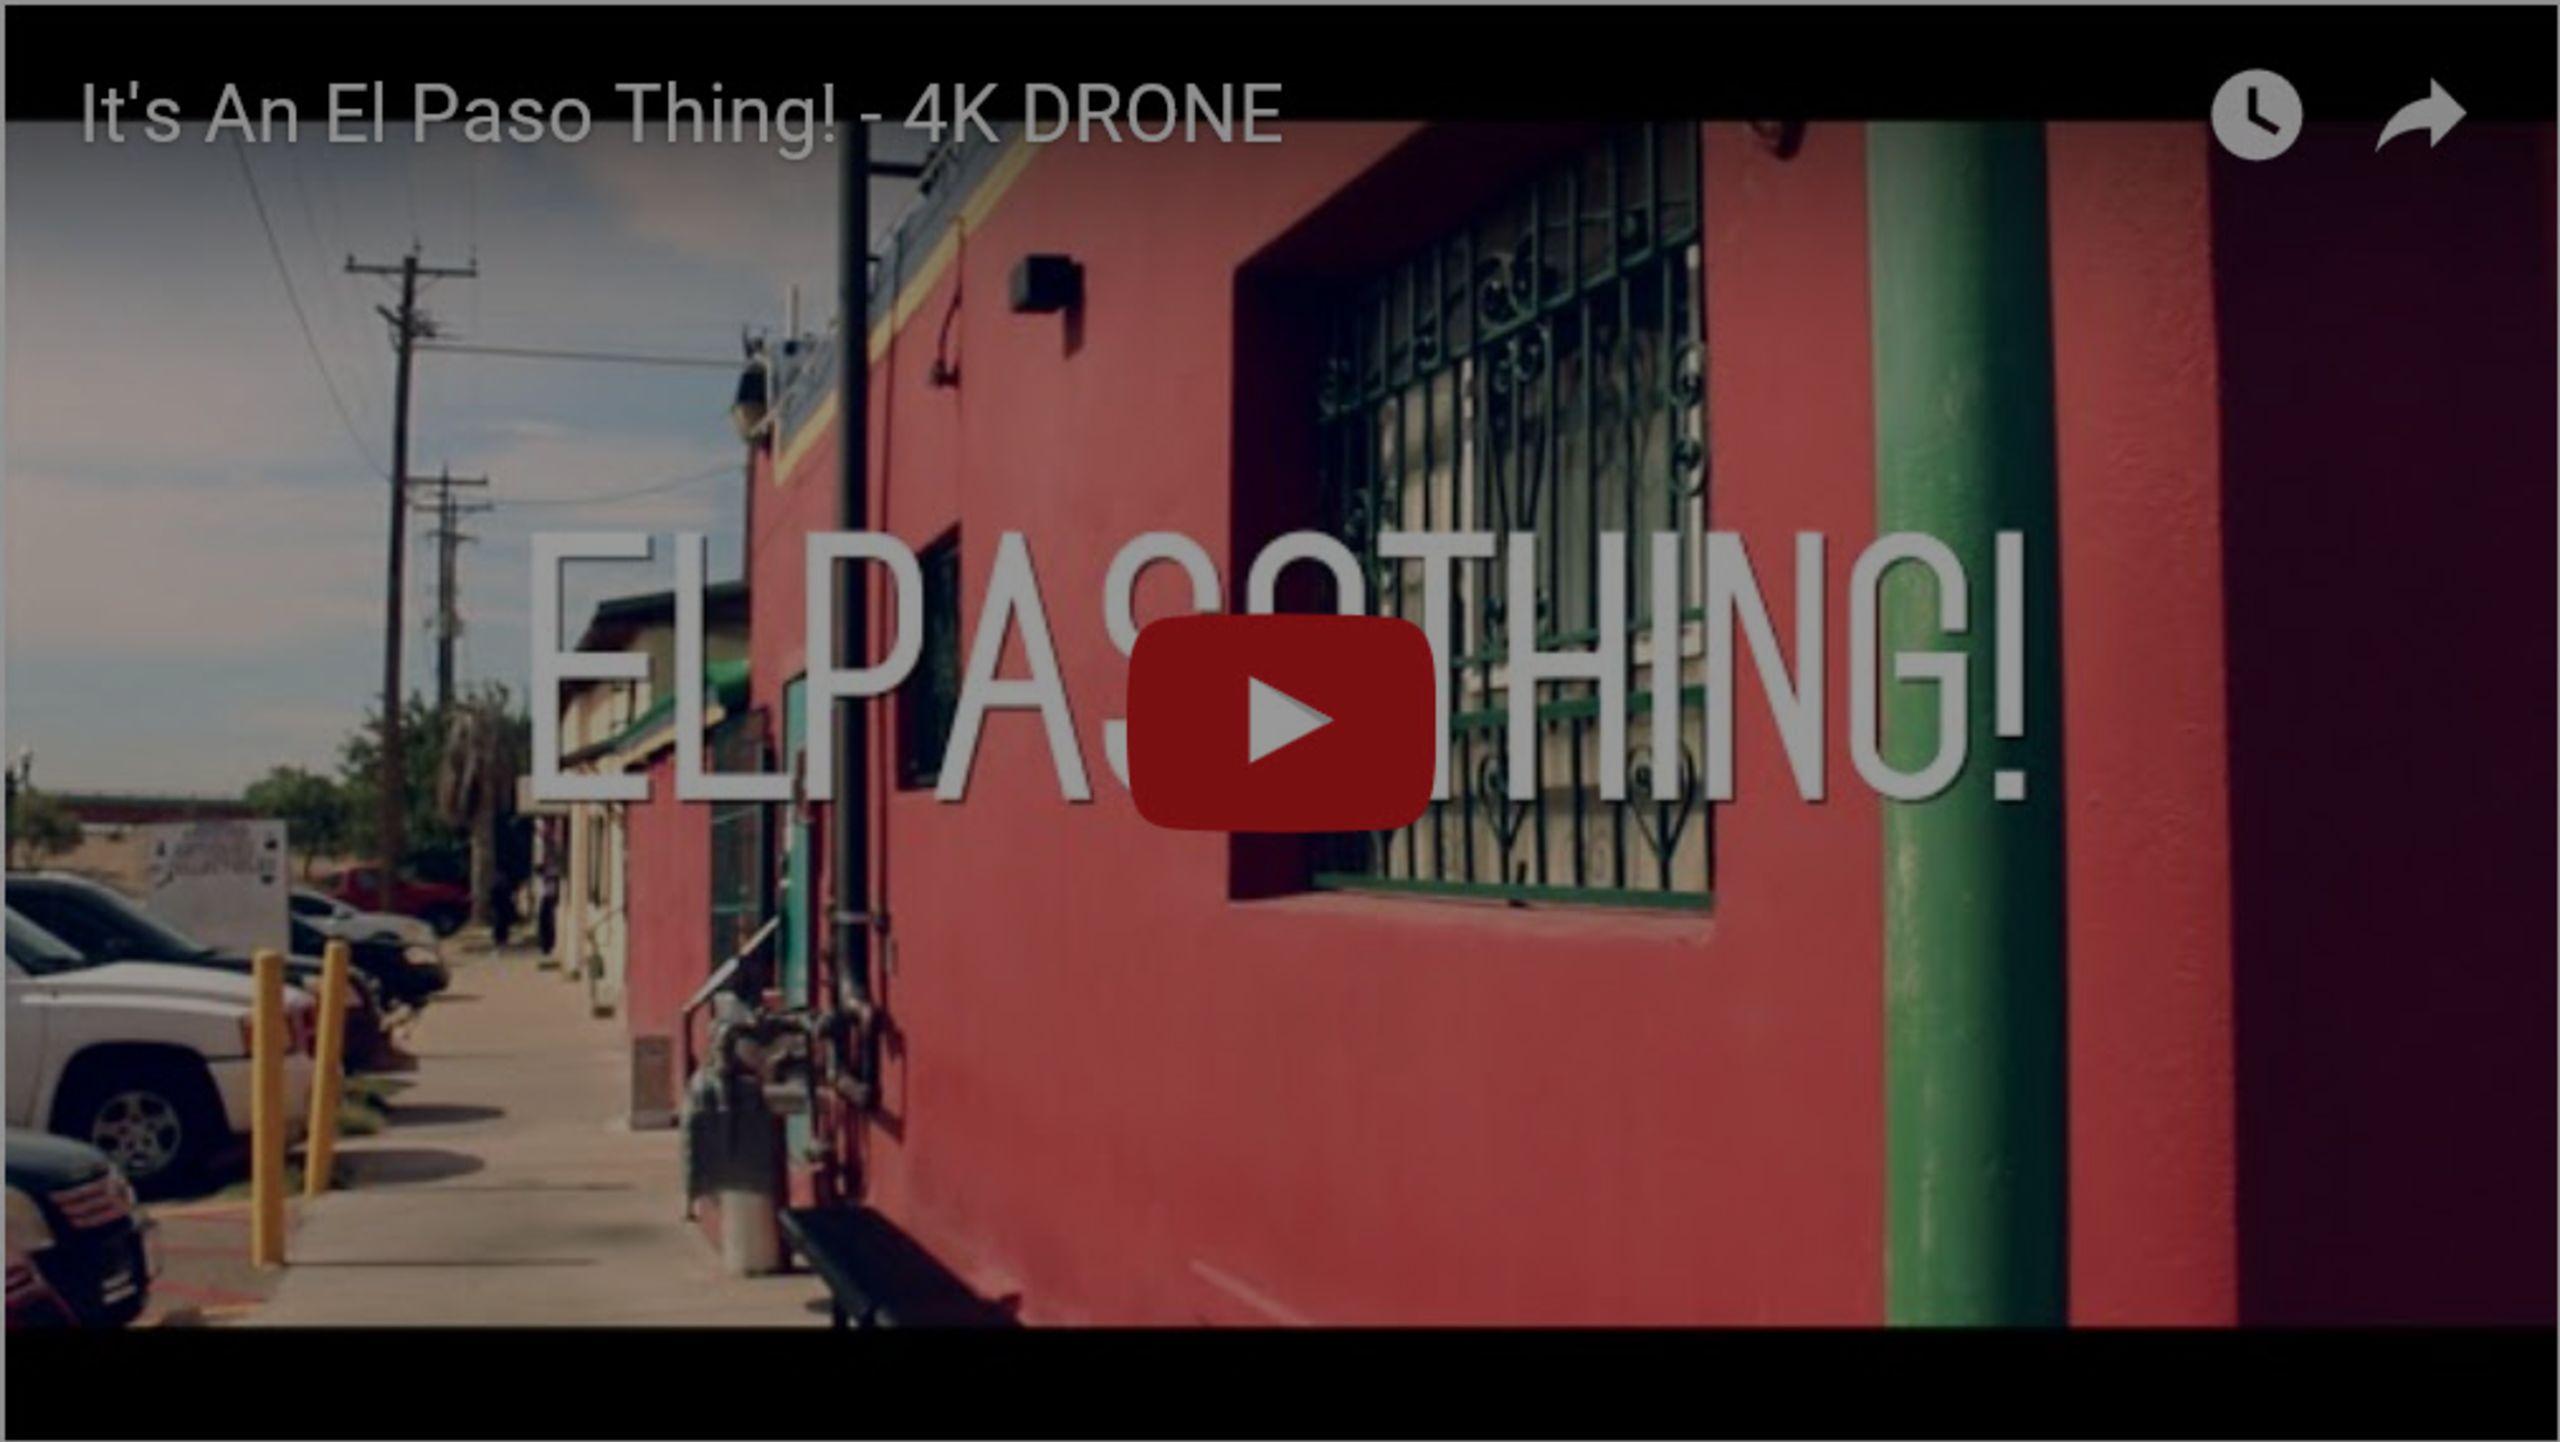 It's An El Paso Thing! – 4K DRONE